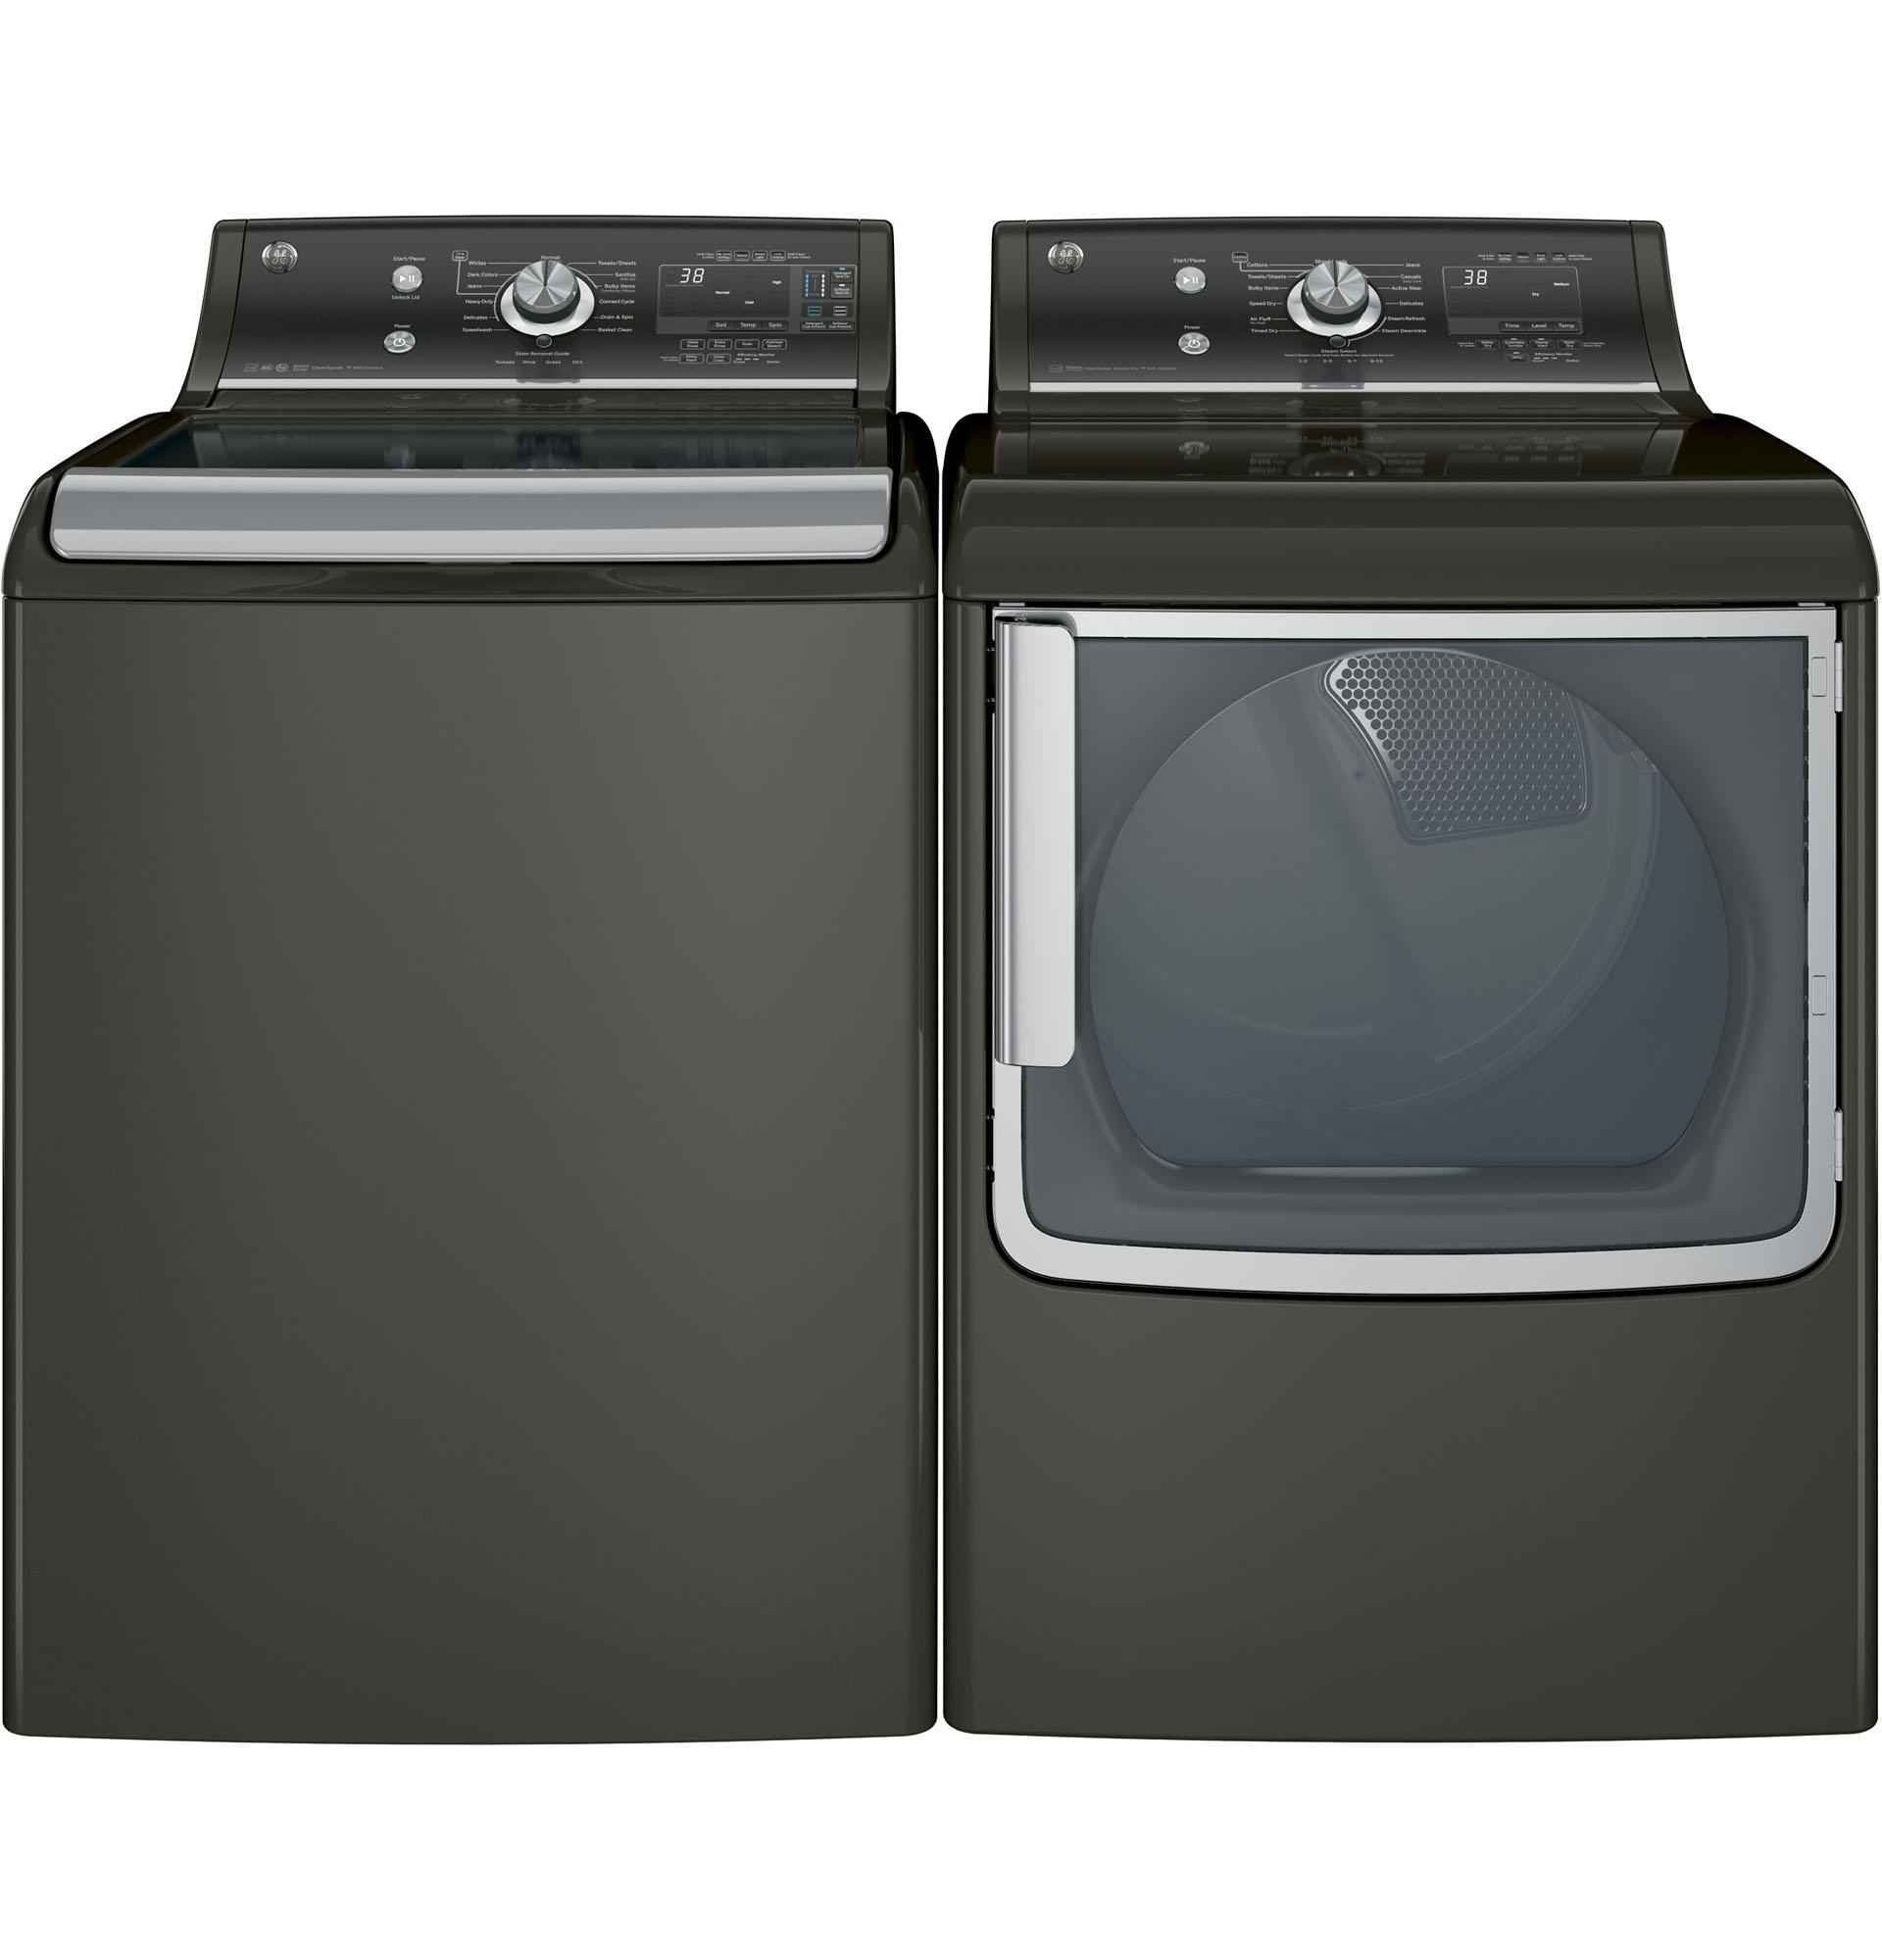 GE Appliances GTW860SPJMC 5.1 DOE cu. ft. Washer - Metallic